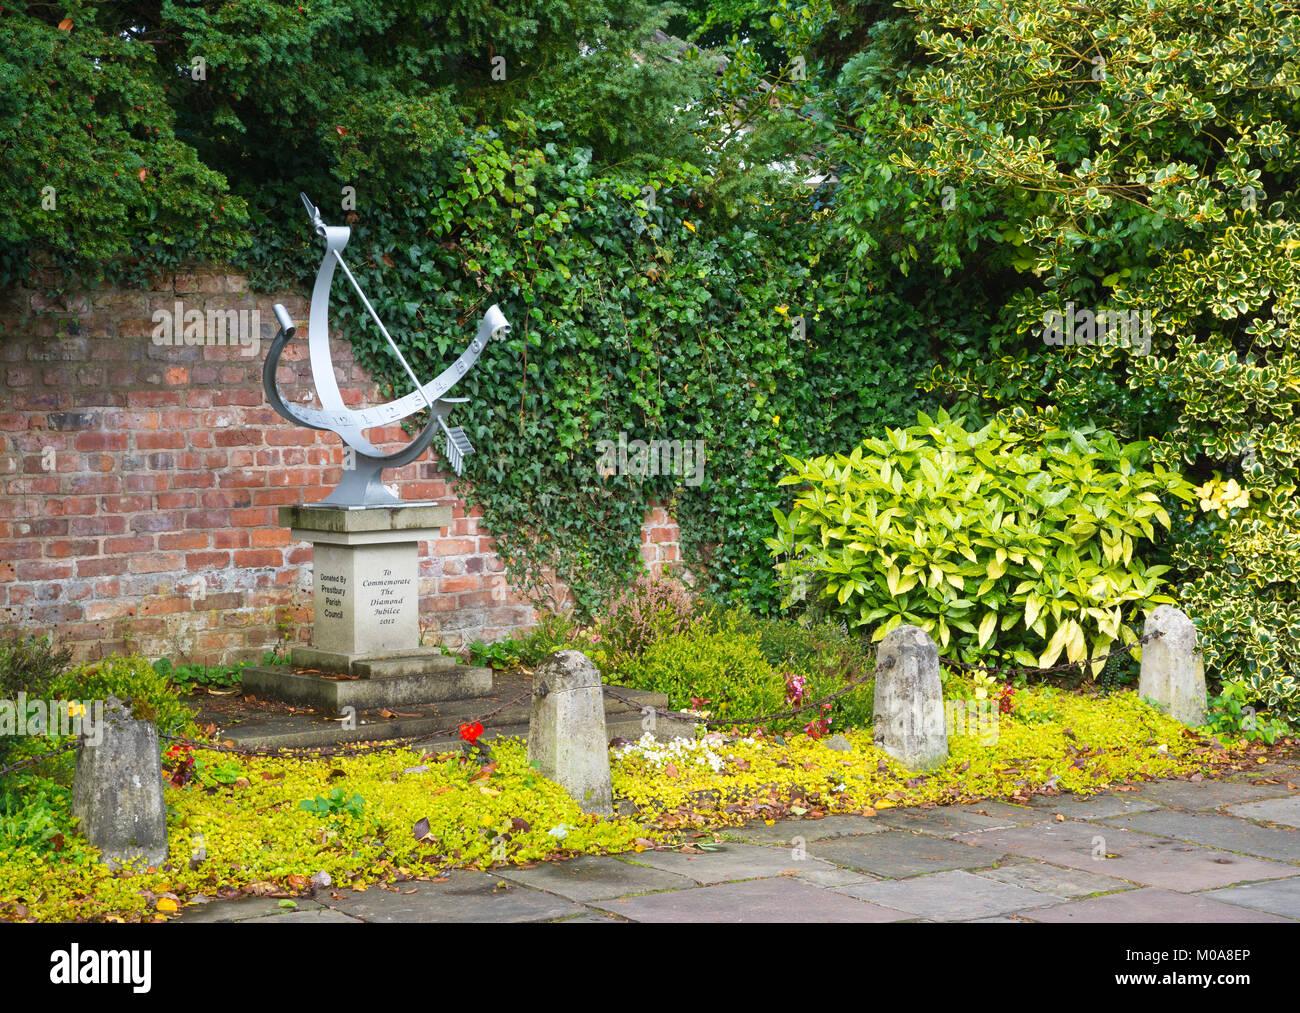 Queen Elizabeth II Diamond Jubilee memorial sundial, Prestbury, Cheshire - Stock Image